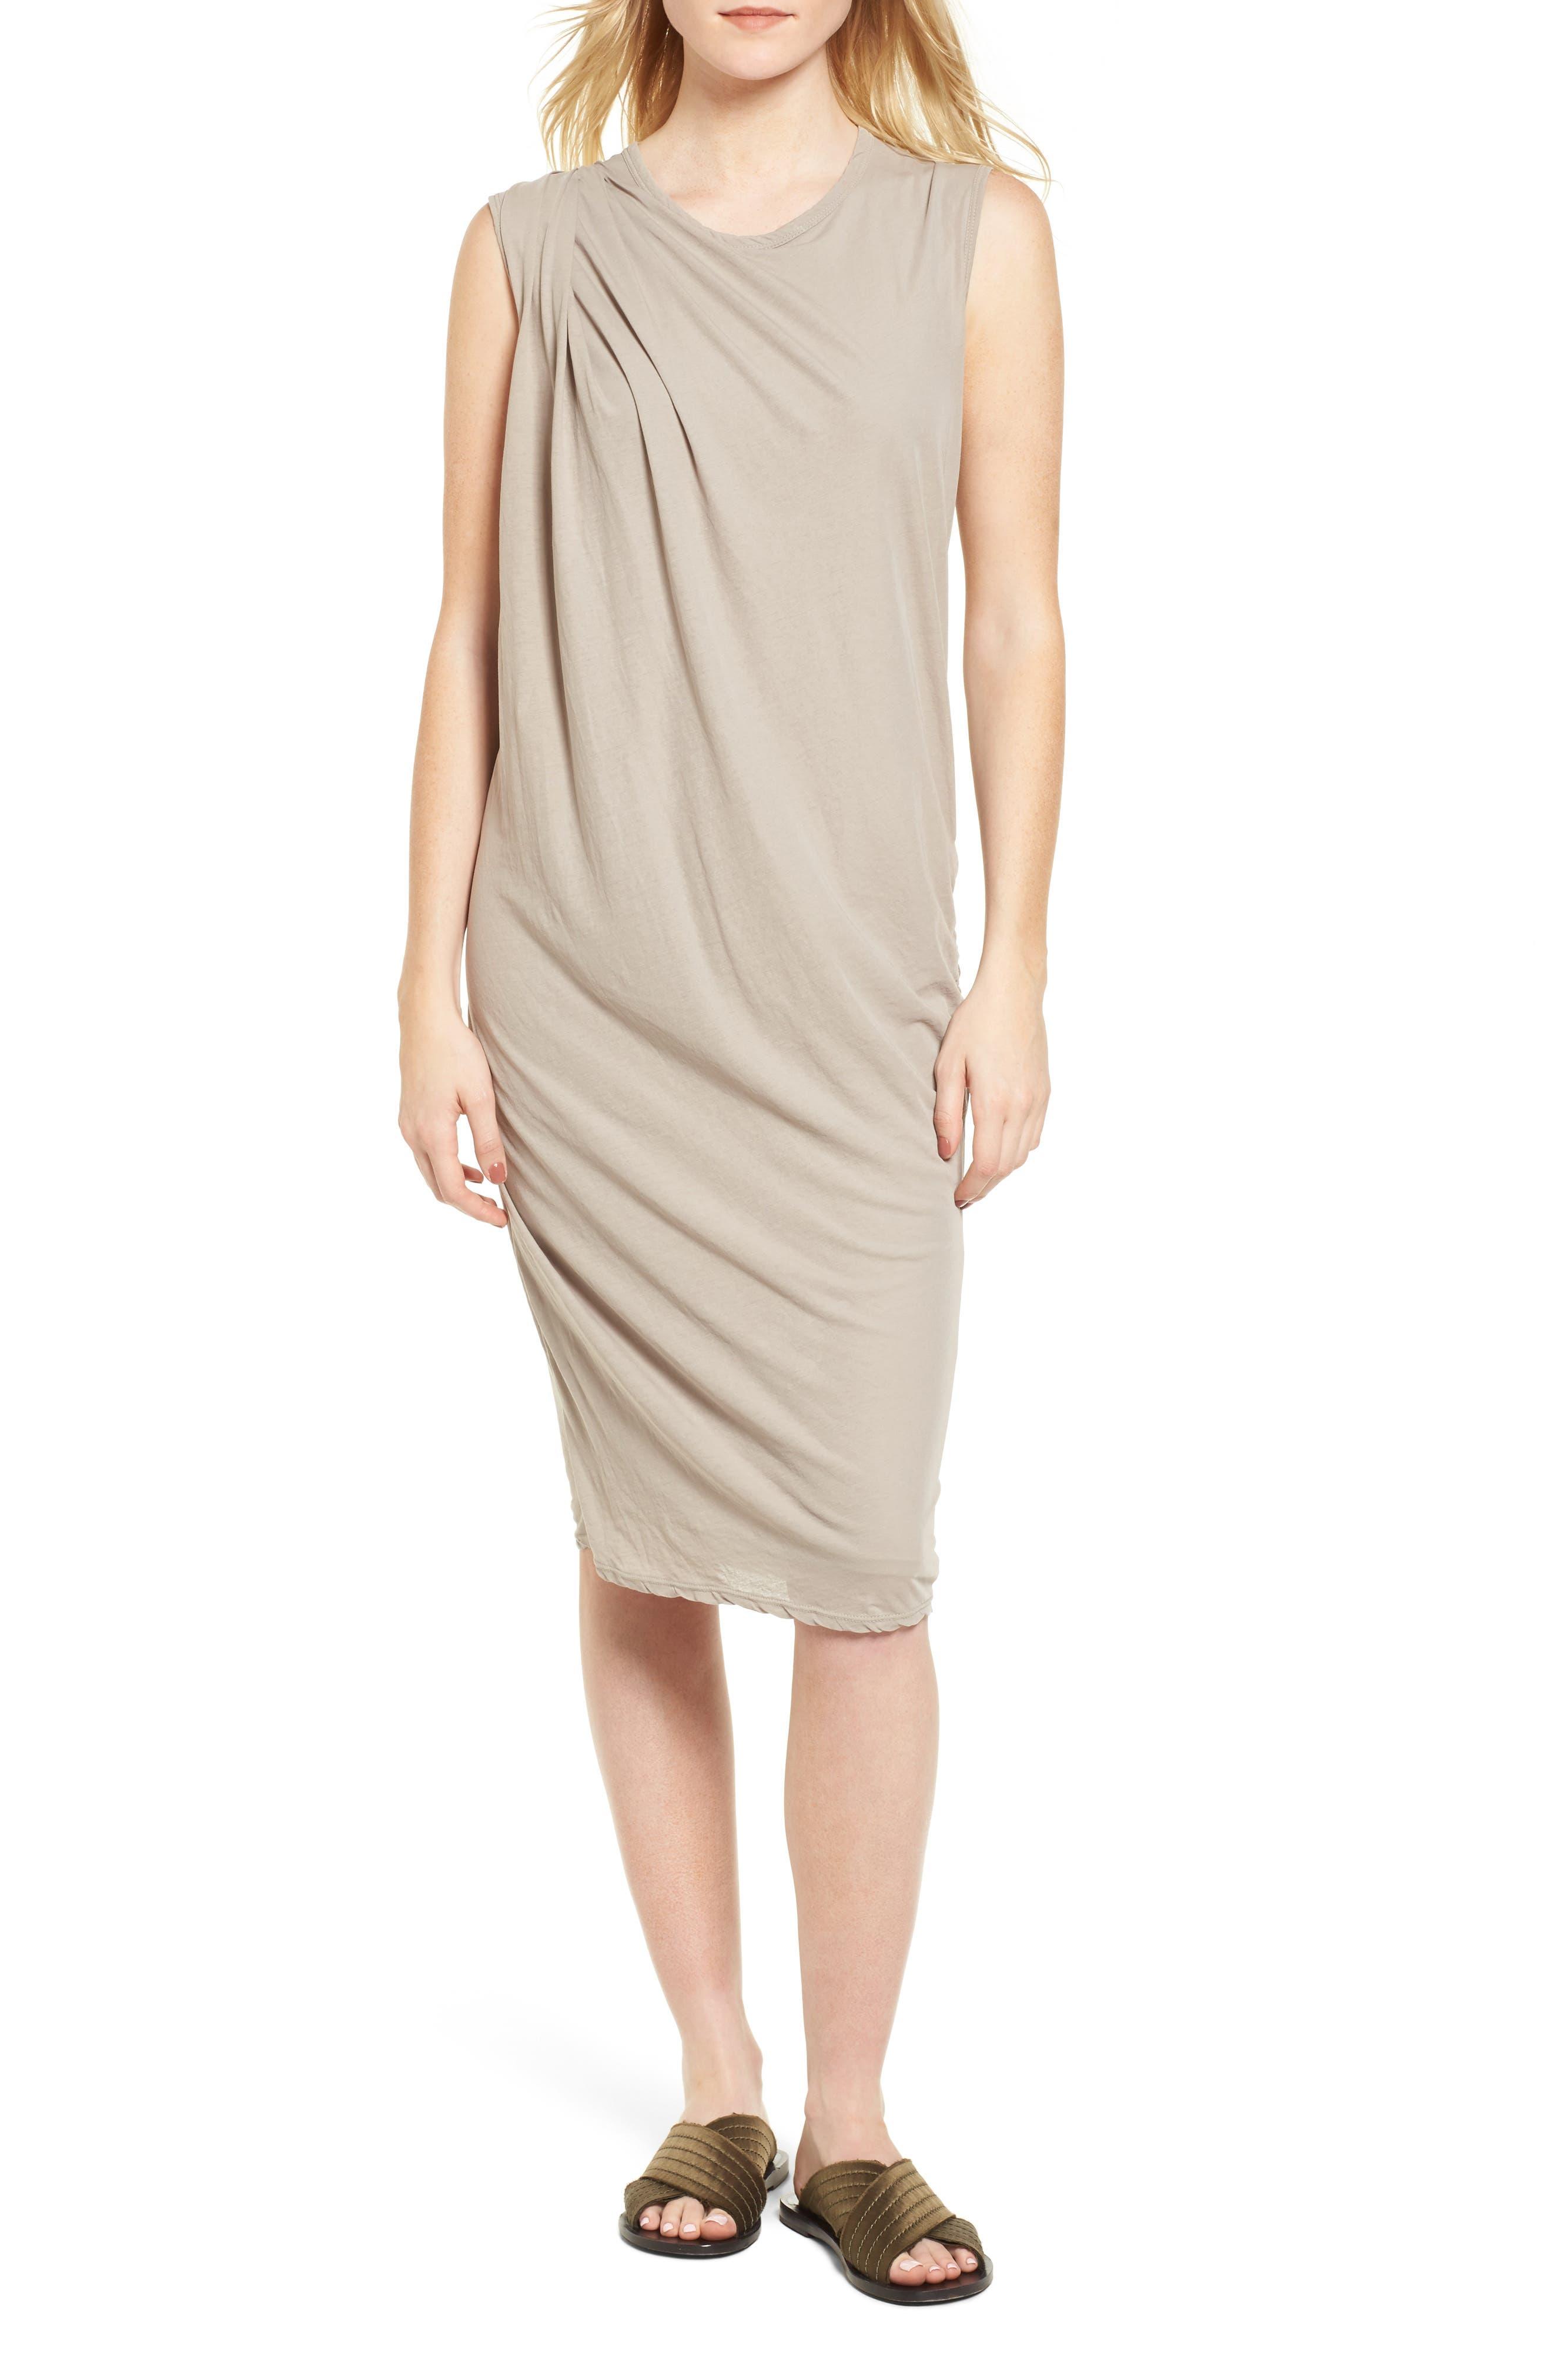 Alternate Image 1 Selected - James Perse Draped Midi Dress